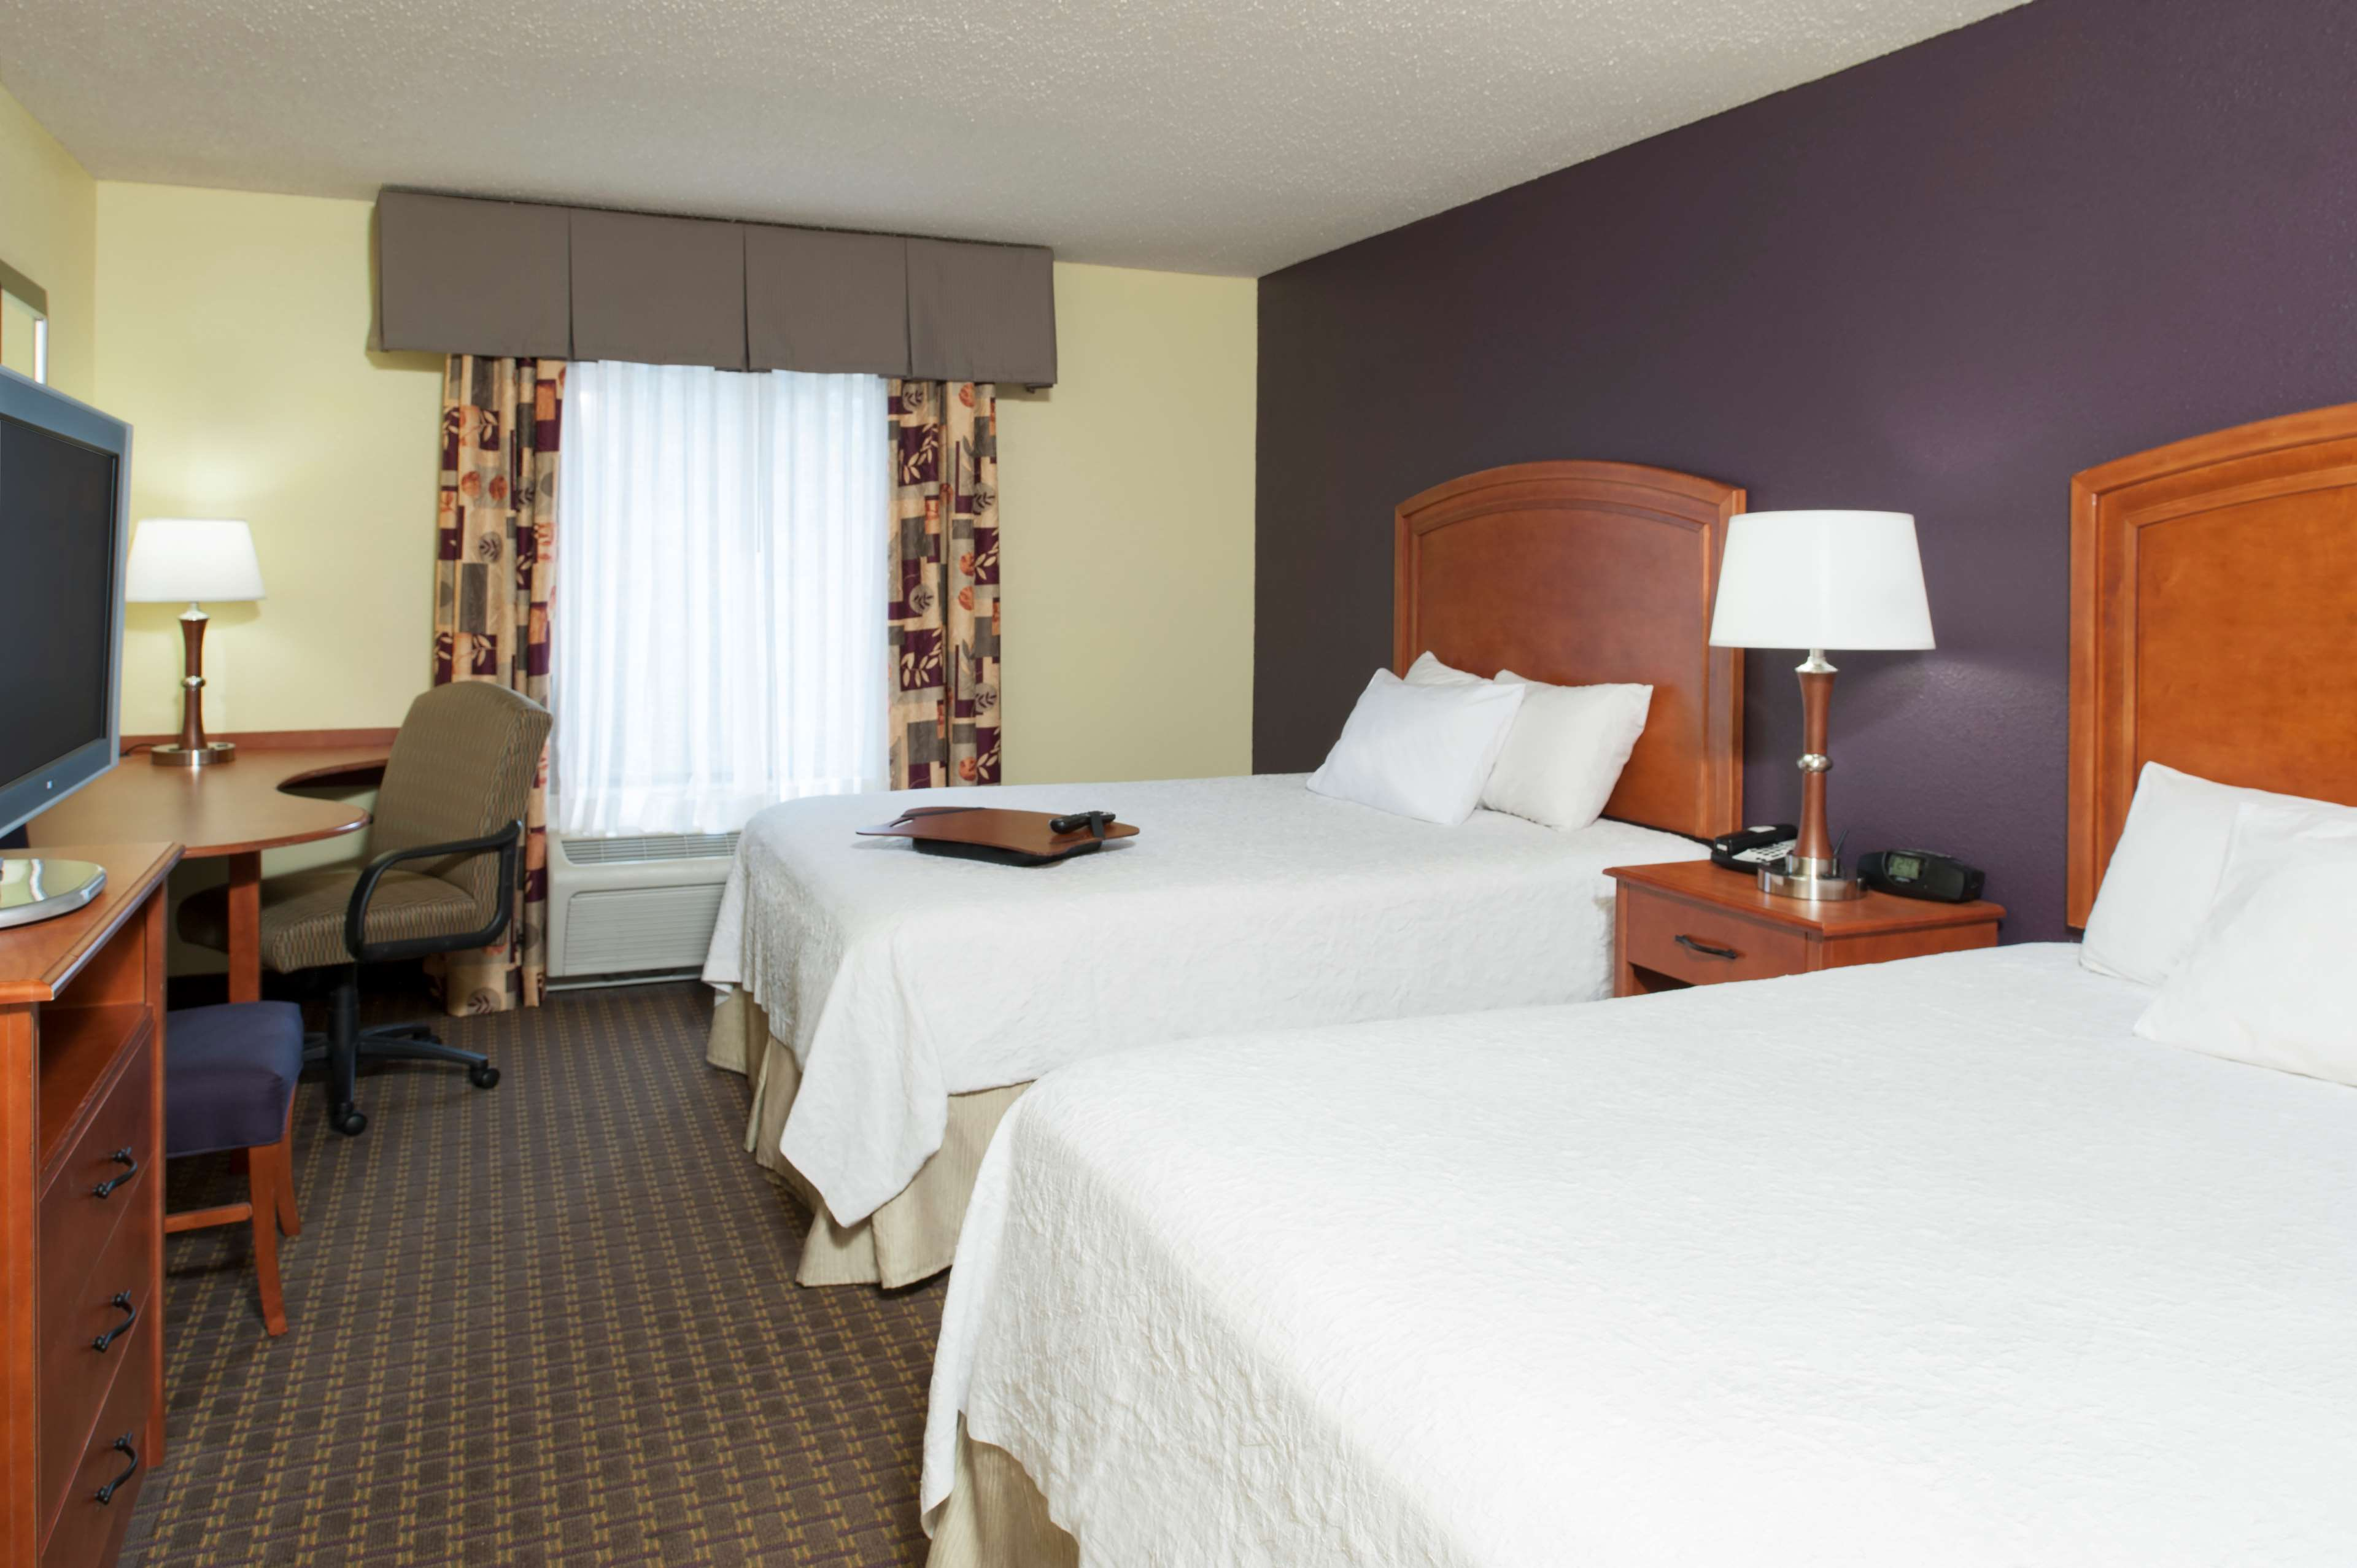 Hampton Inn & Suites Grand Rapids-Airport 28th St image 7